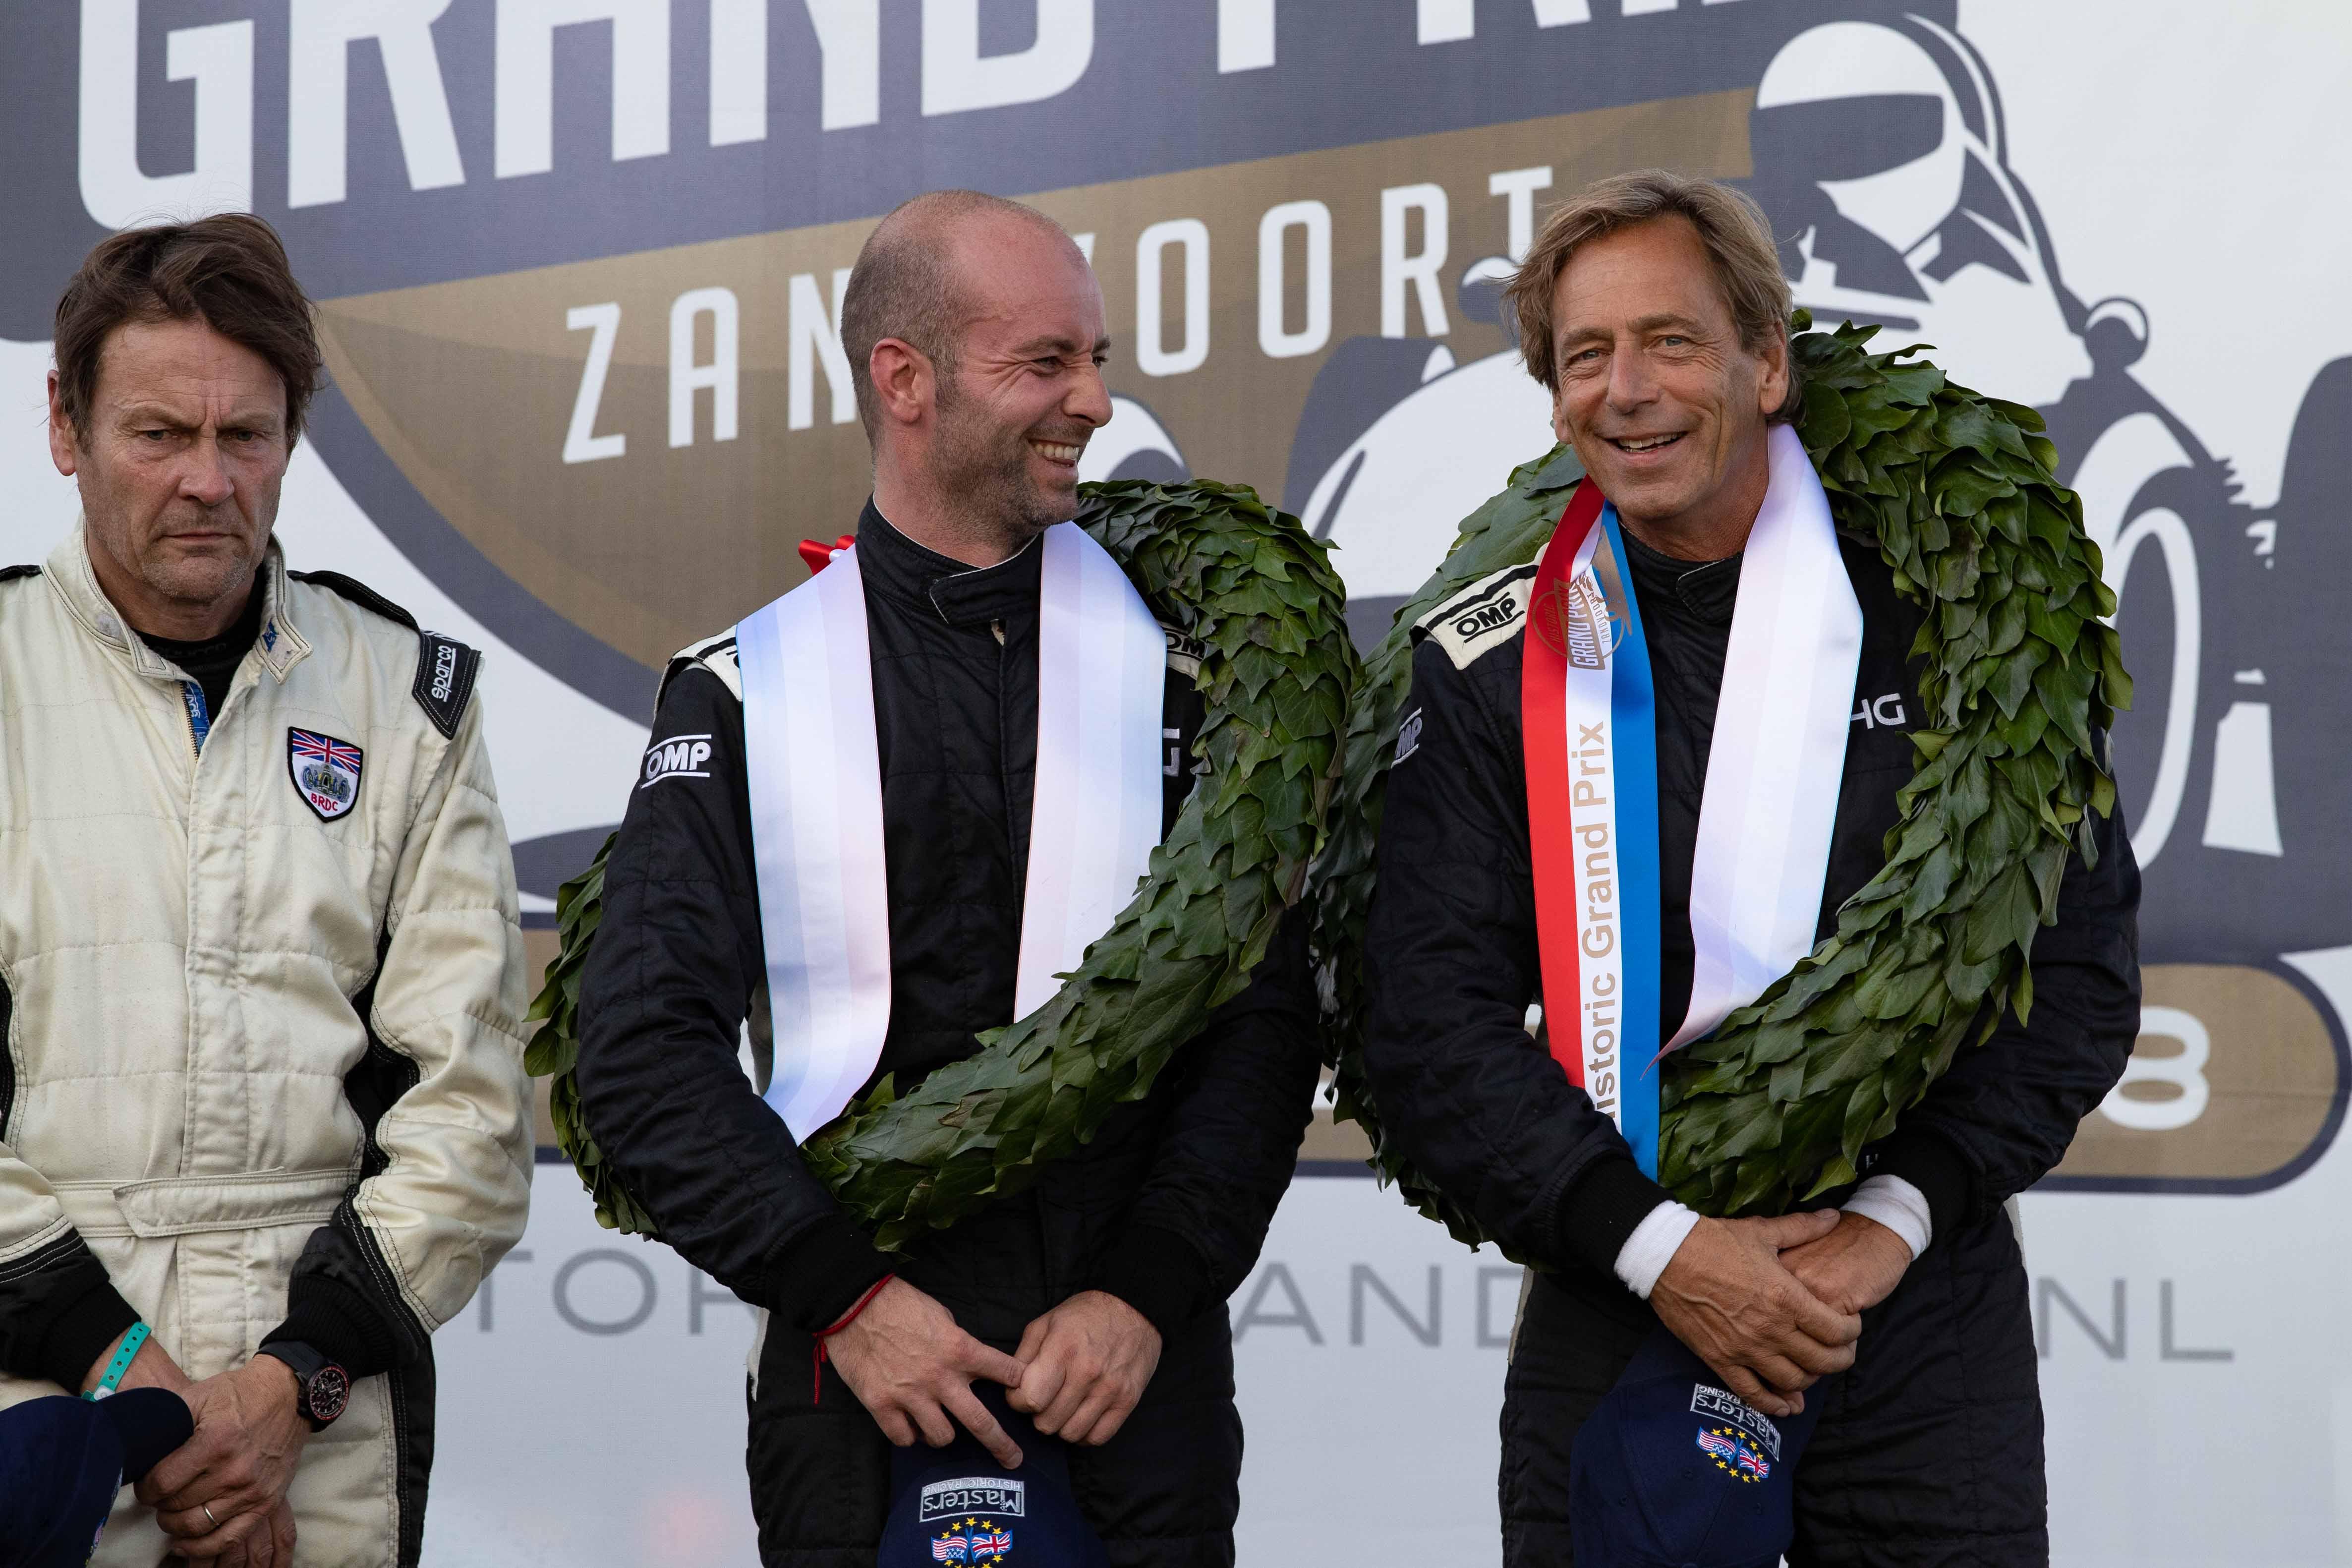 historische grand prix zandvoort 2018